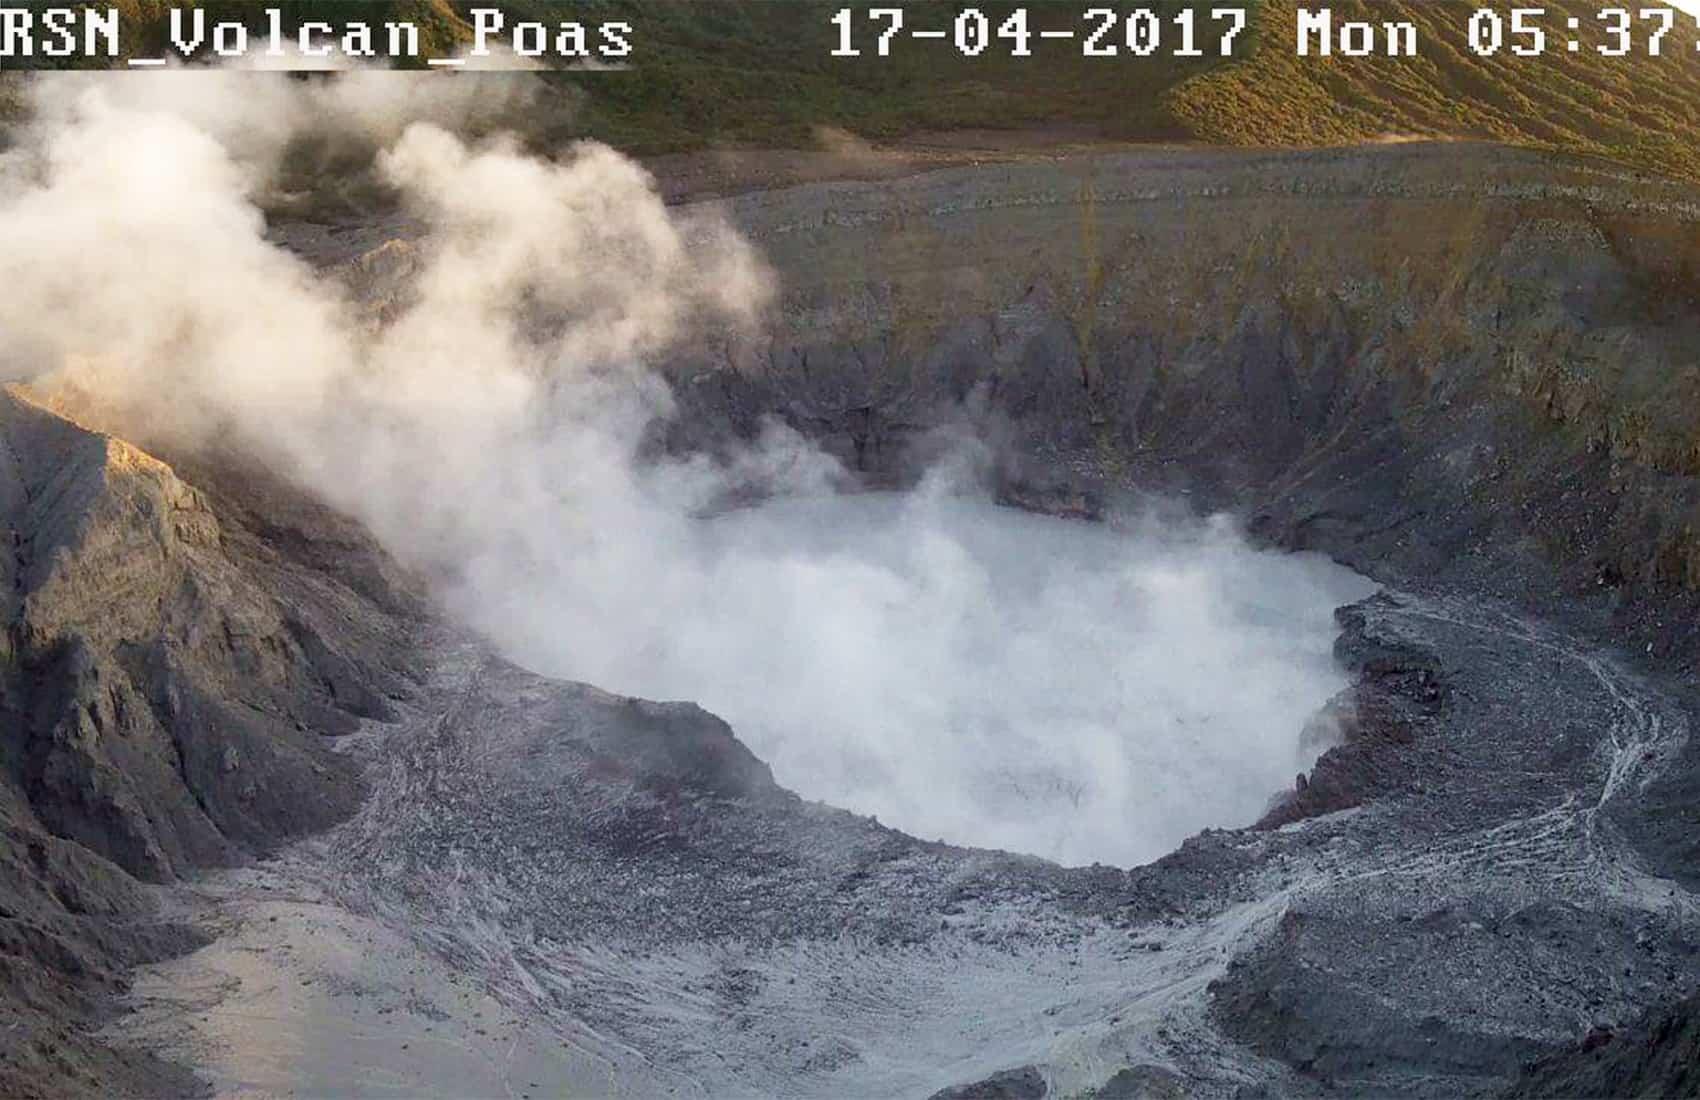 Poás Volcano. April 17, 2017.